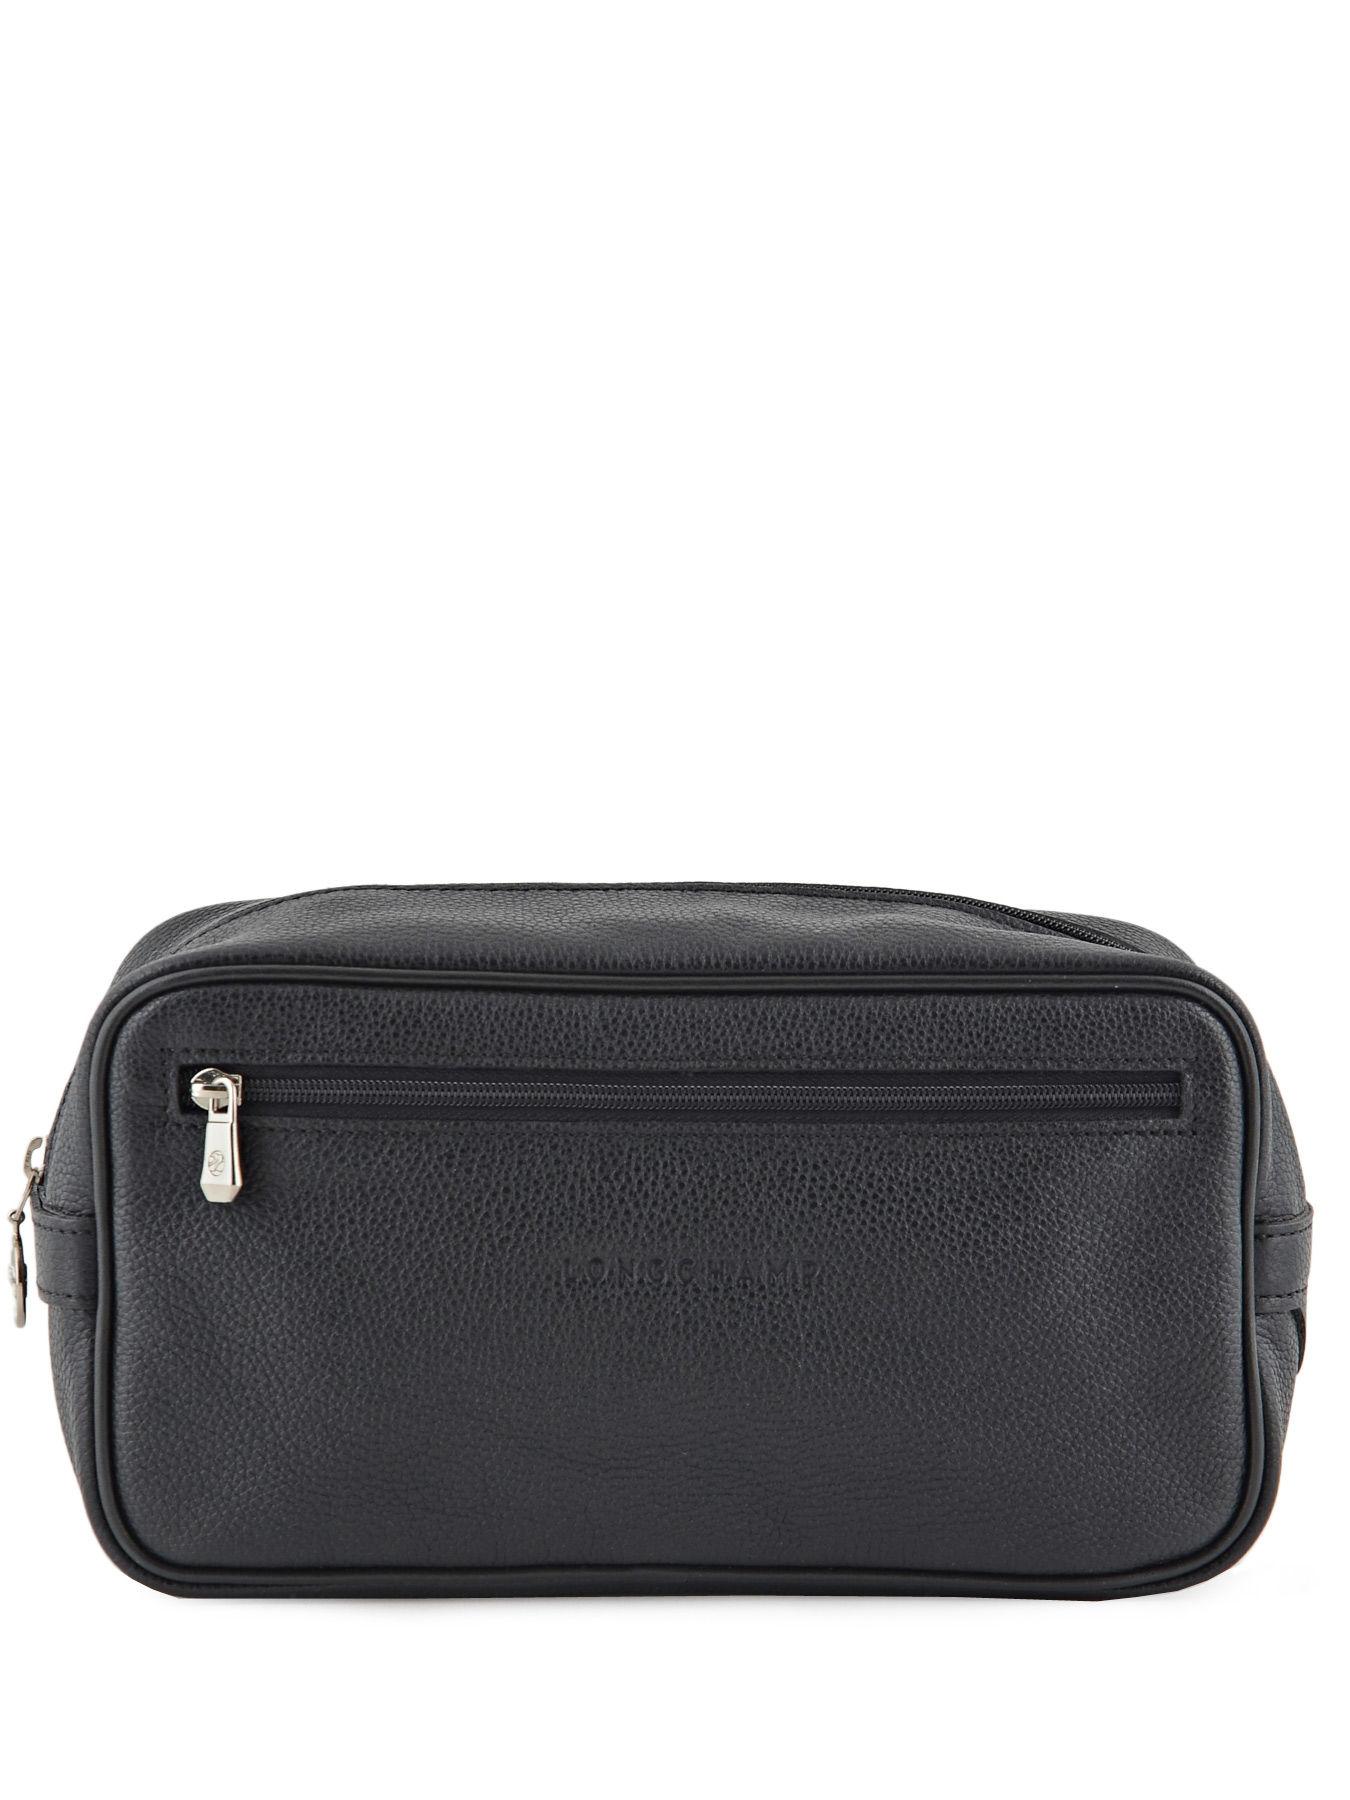 4d77540590 Longchamp Toiletry case Black  Longchamp Toiletry case Black ...